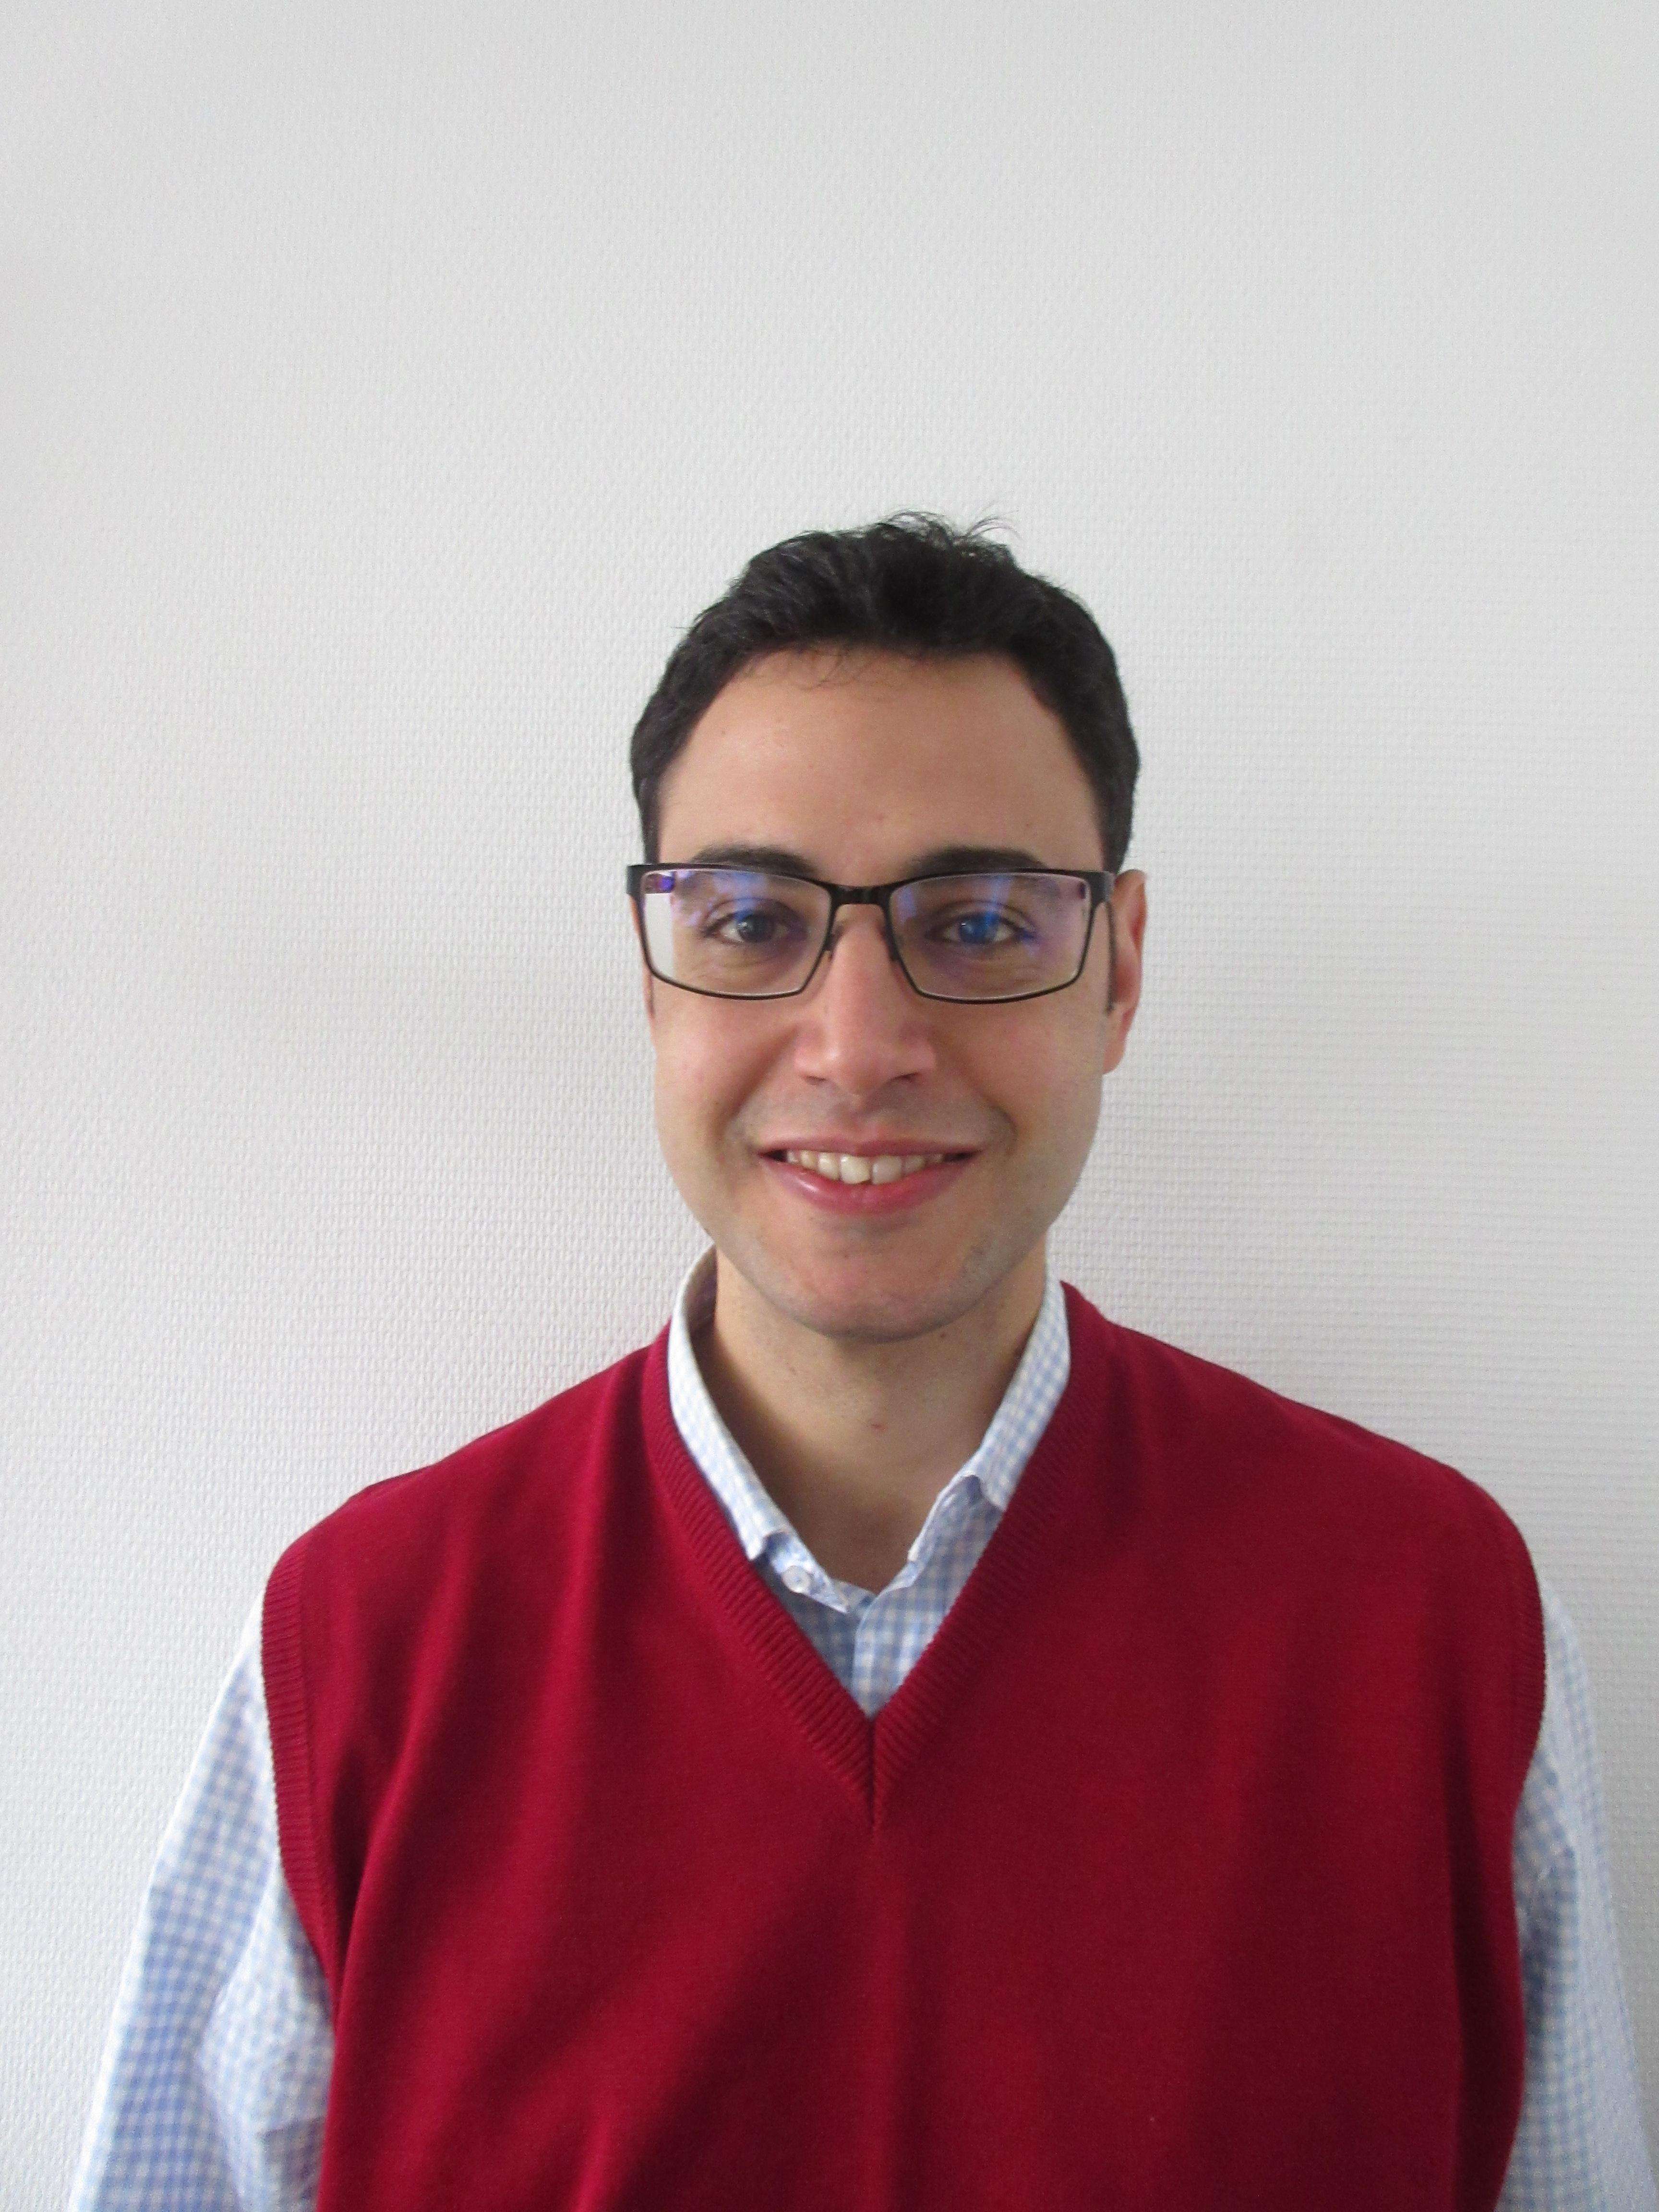 Picture of Jesus Gonzalez Cobos